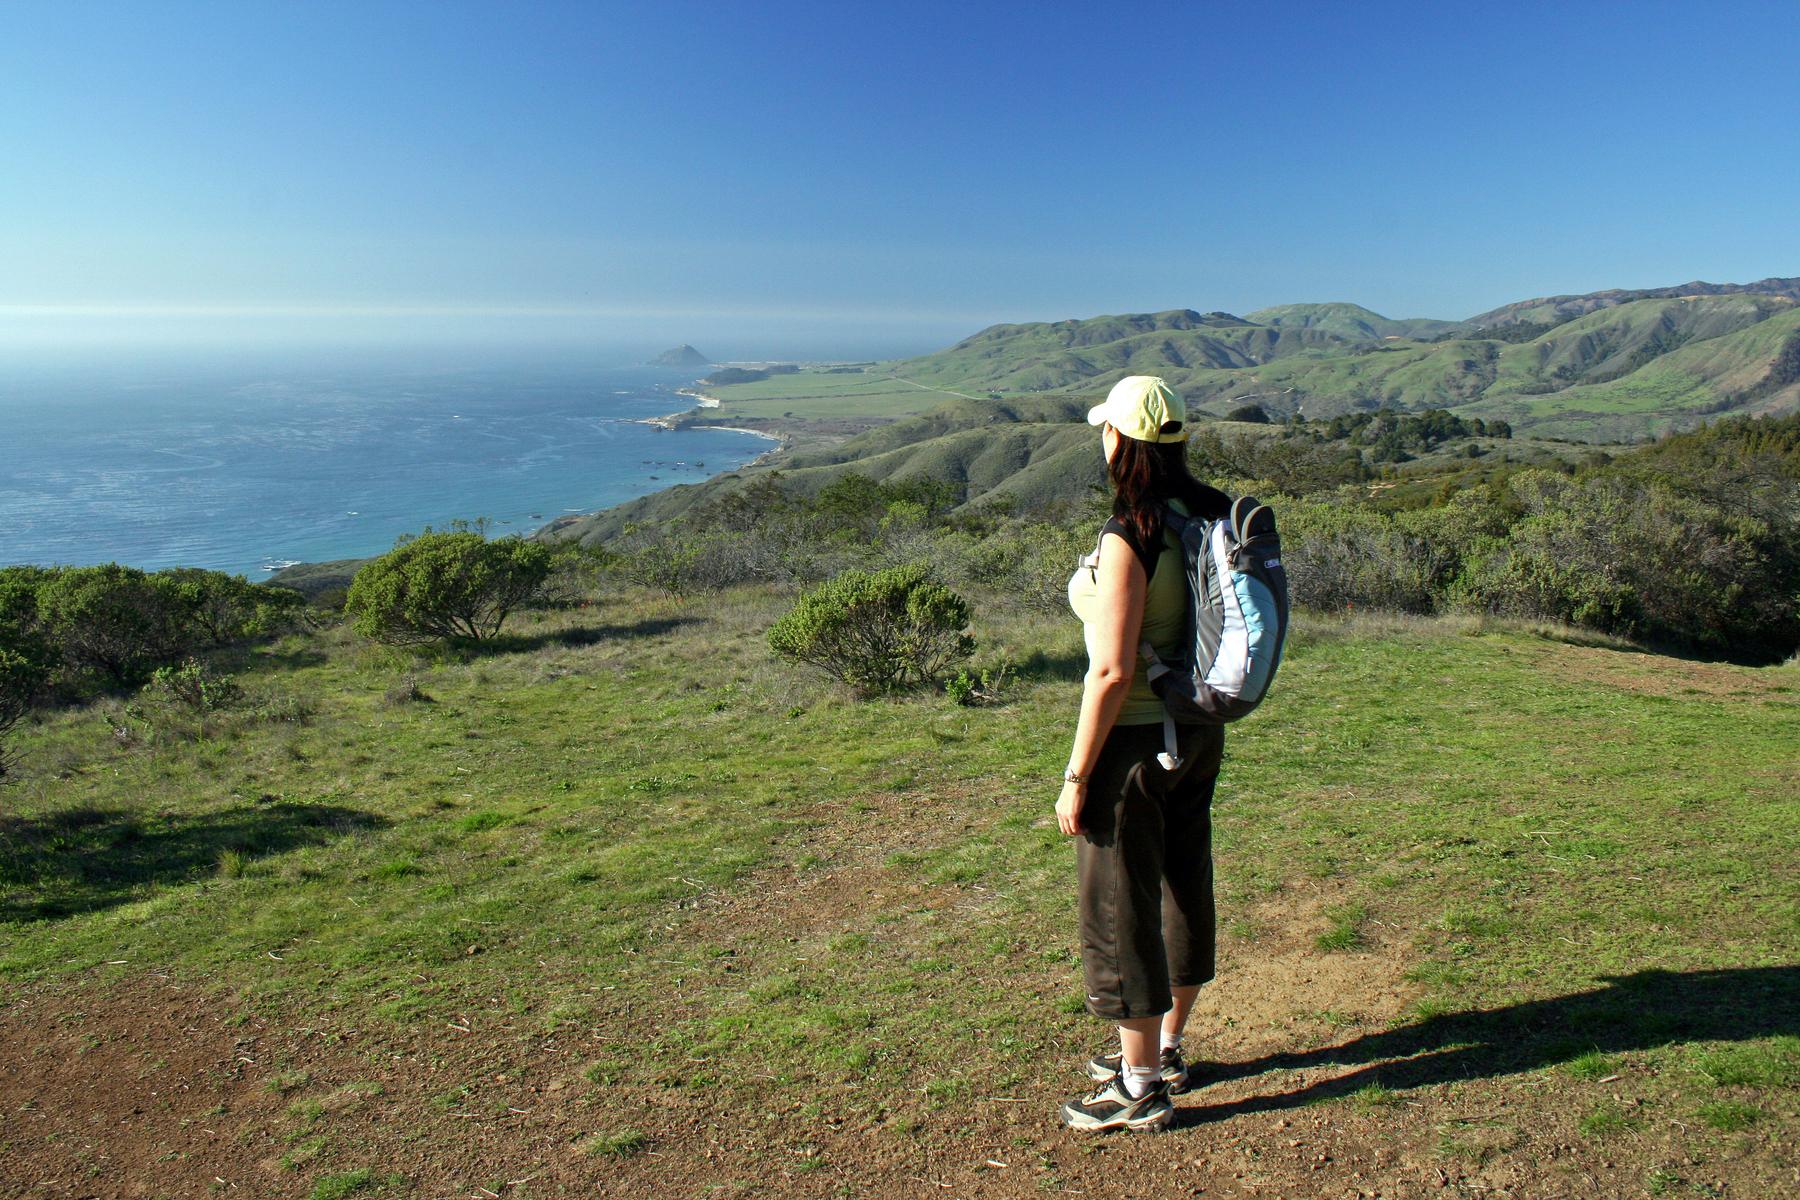 Andrew Molera State Park, Big Sur coast, California